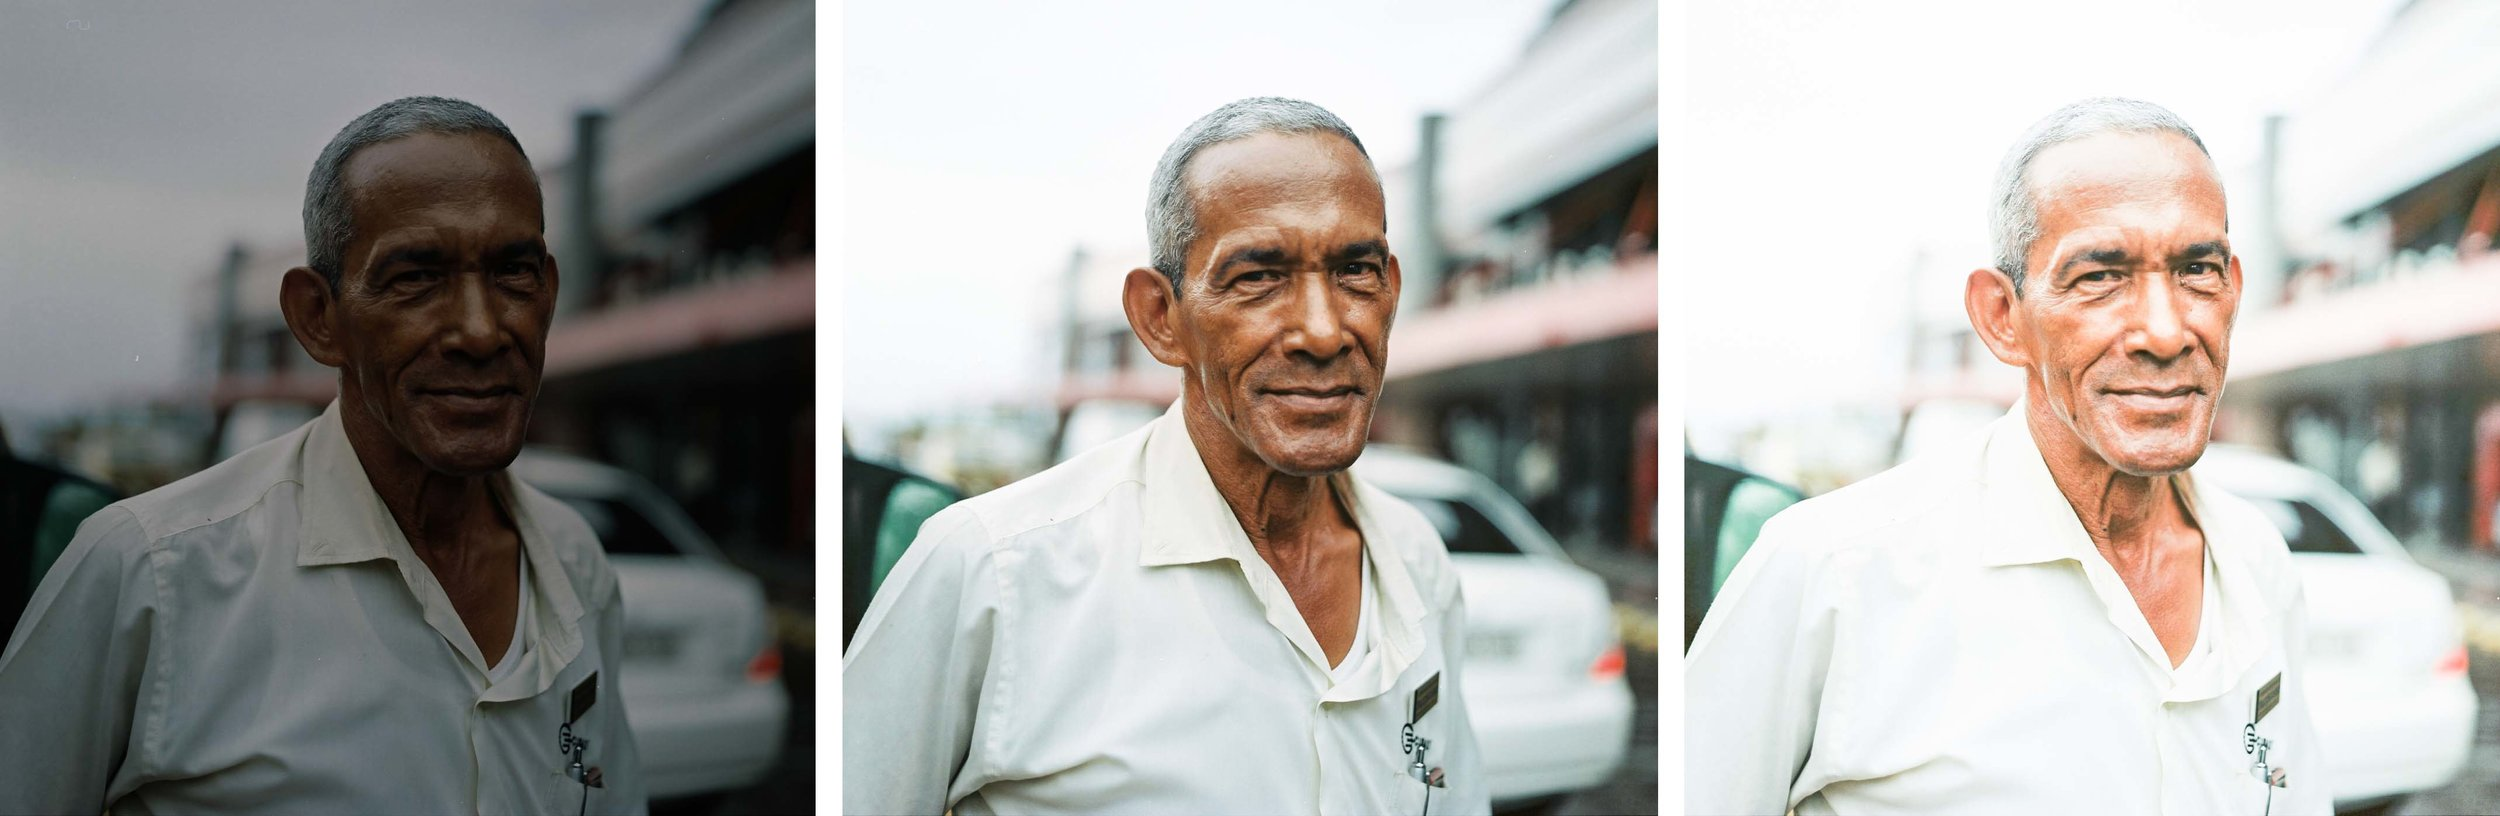 Taxista_Cuba_Hasselblad500c.Portra400.jpg